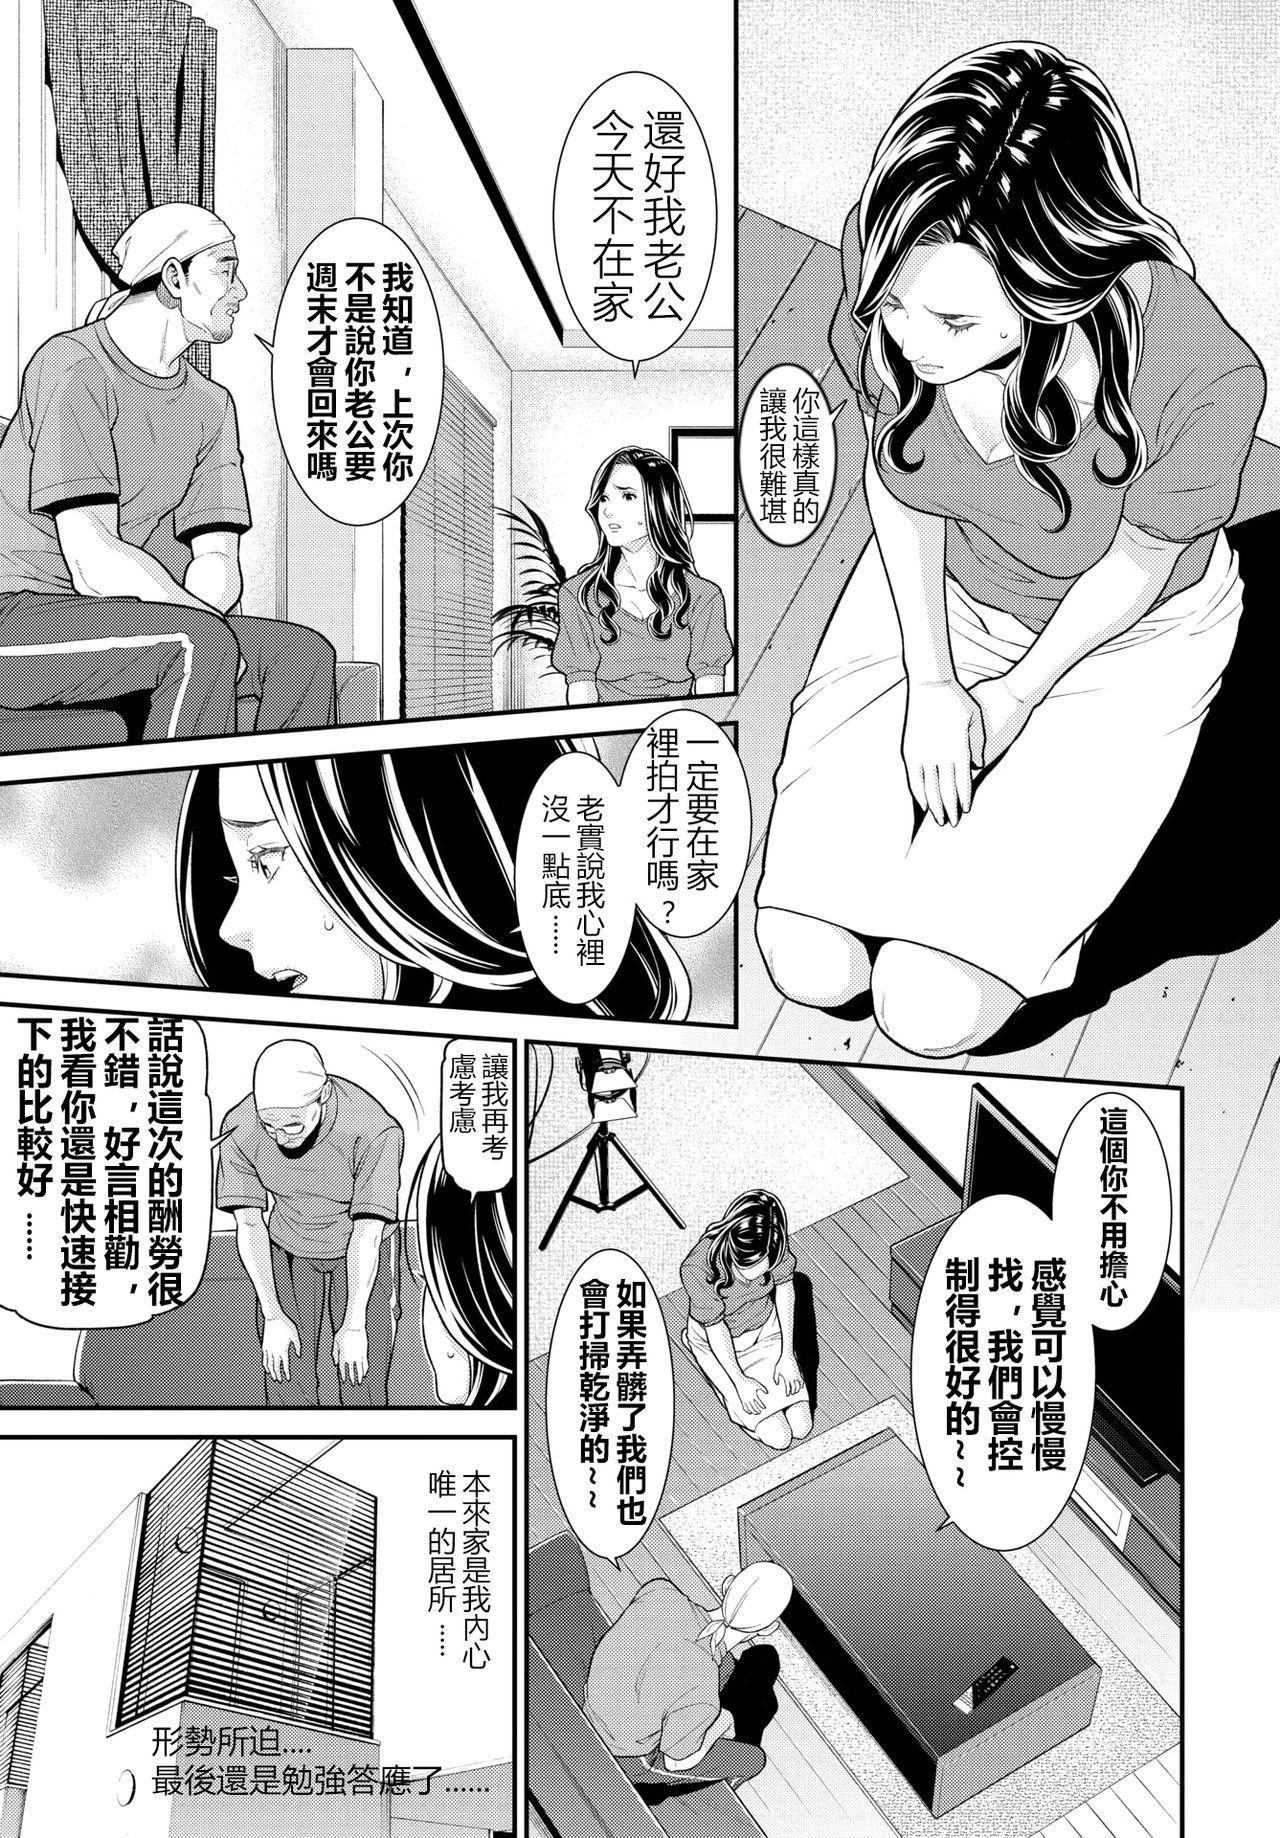 [Syuuen] Secret Wife  1-6 [Chinese][鼠灣漢化](210206最新修复完整版)【極品人妻NTR】 53